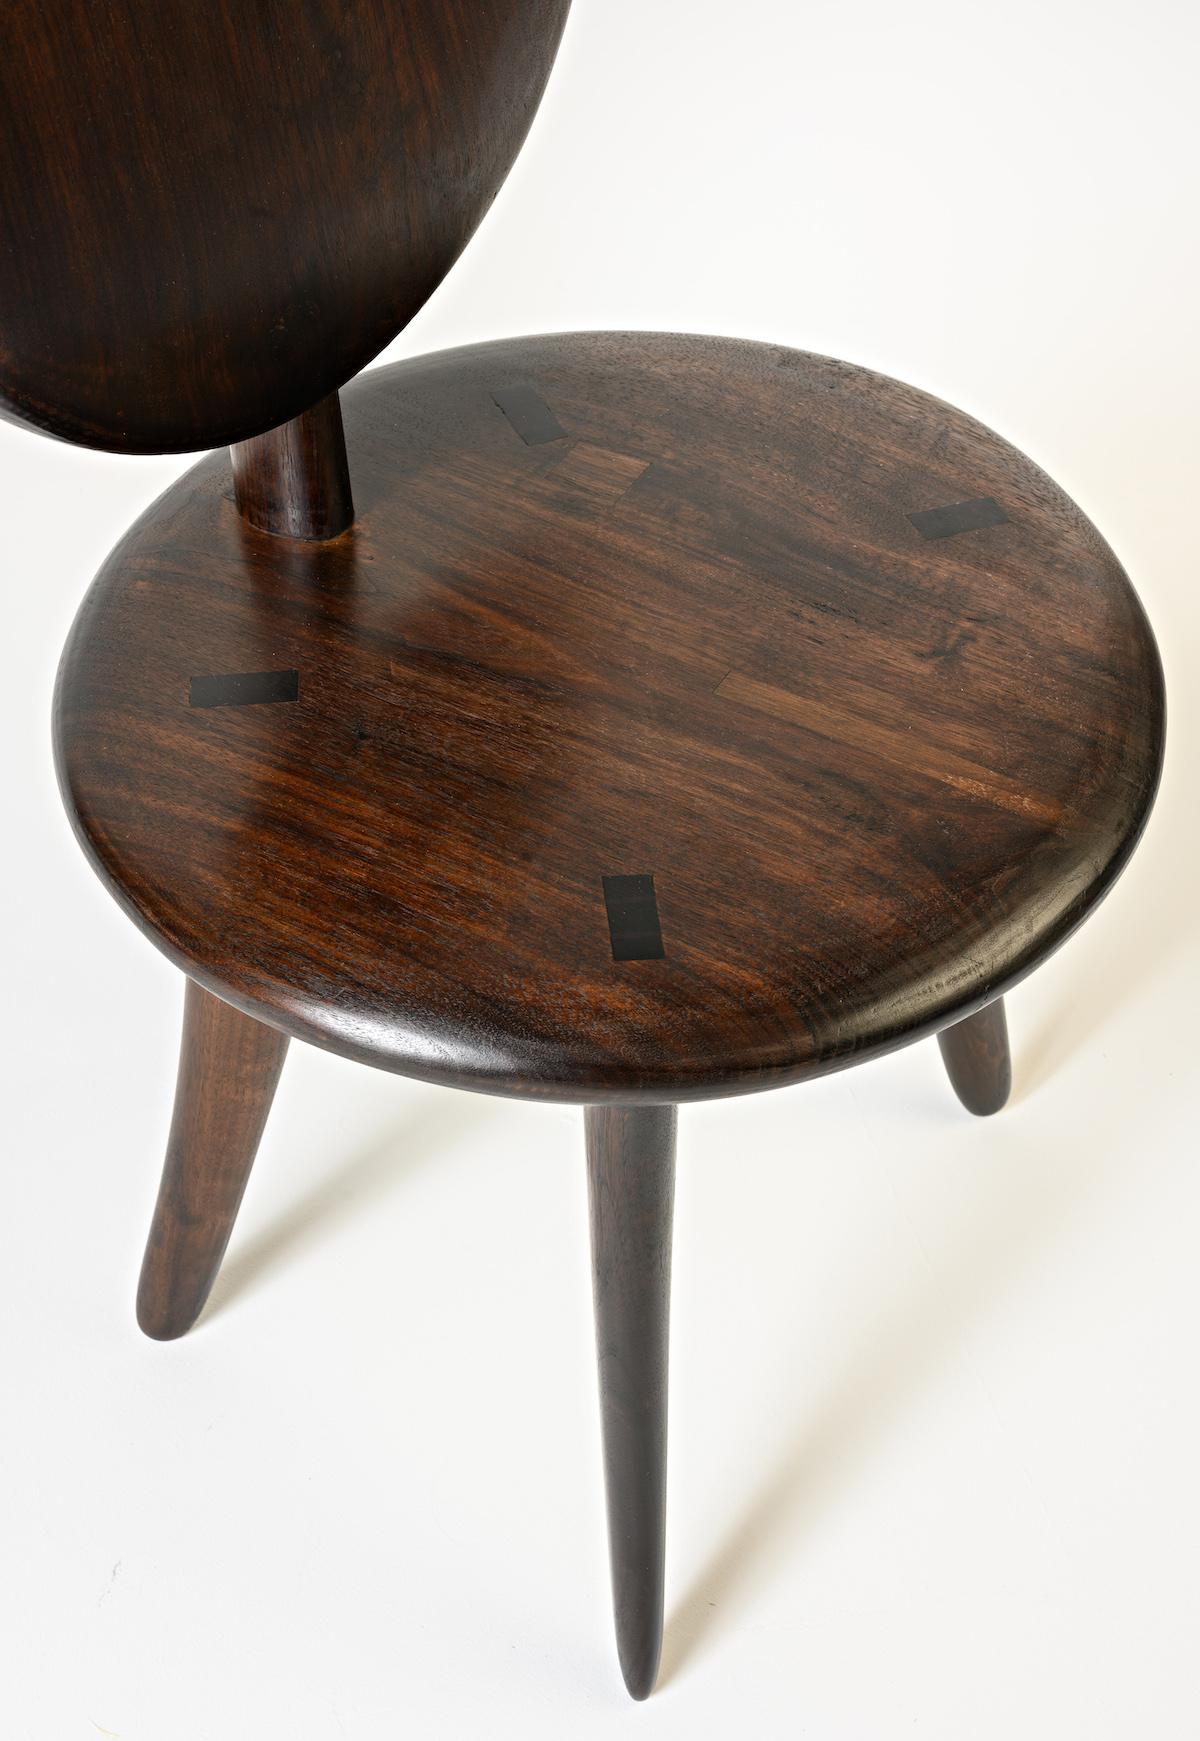 Seat detail of Willa's Chair by artist Christopher Kurtz